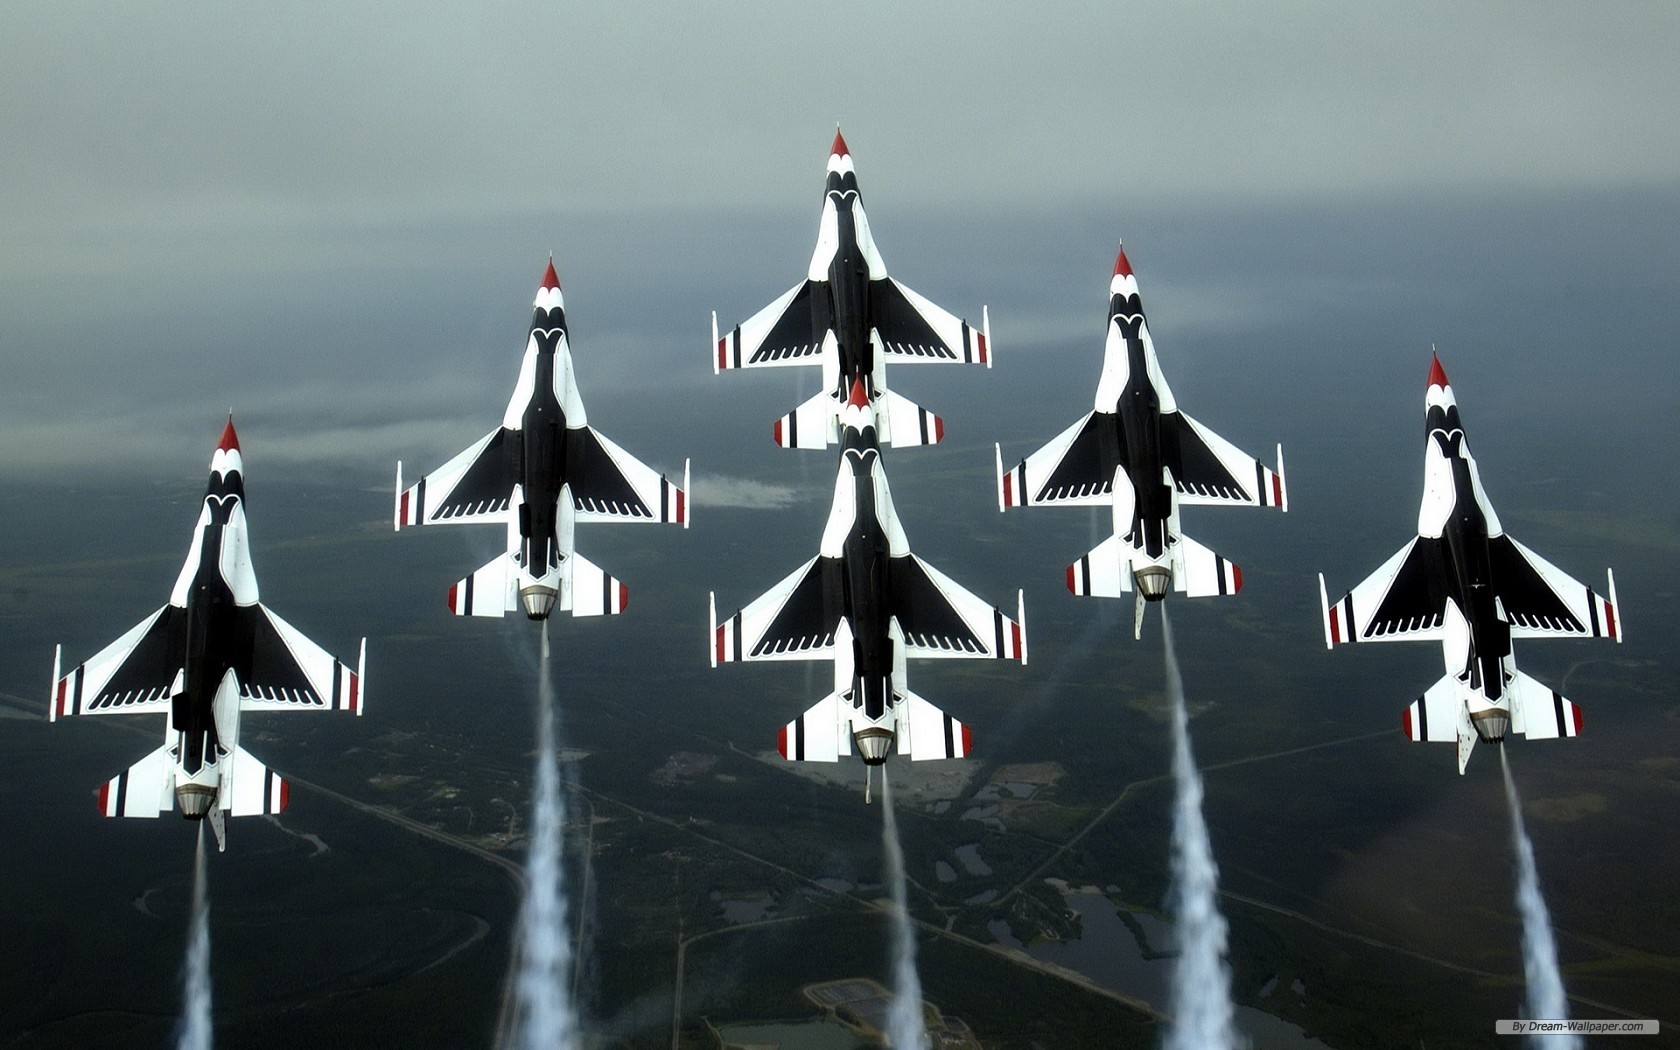 Photography wallpaper   USAF Thunderbirds wallpaper   1680x1050 1680x1050